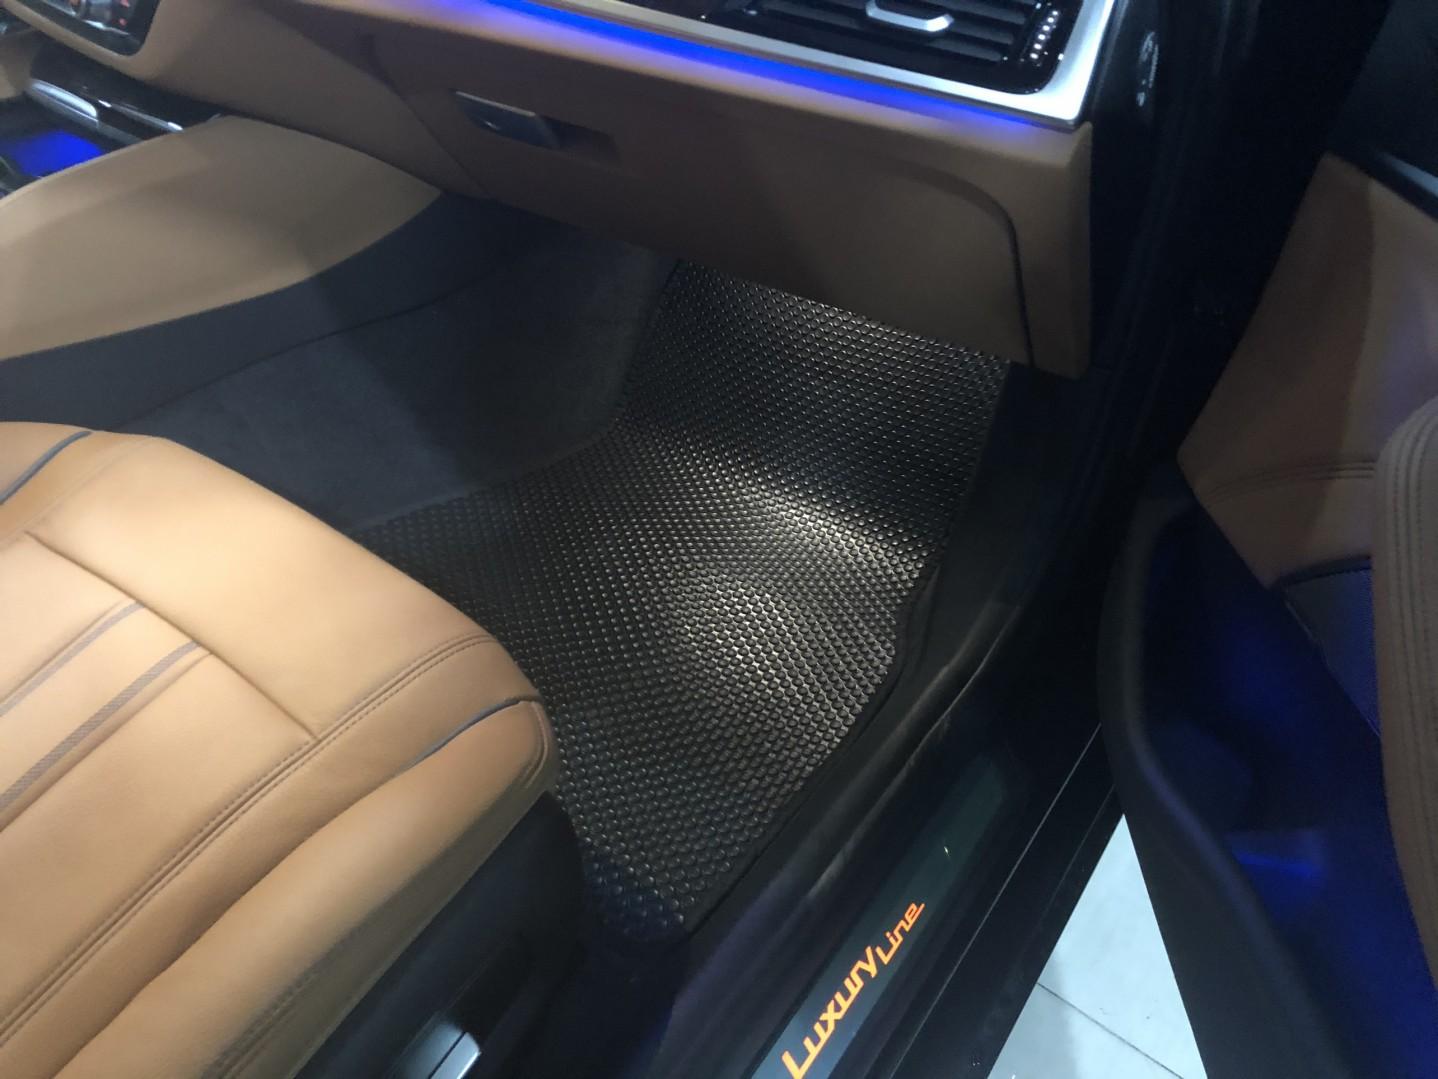 Thảm lót sàn BMW 530i 2020